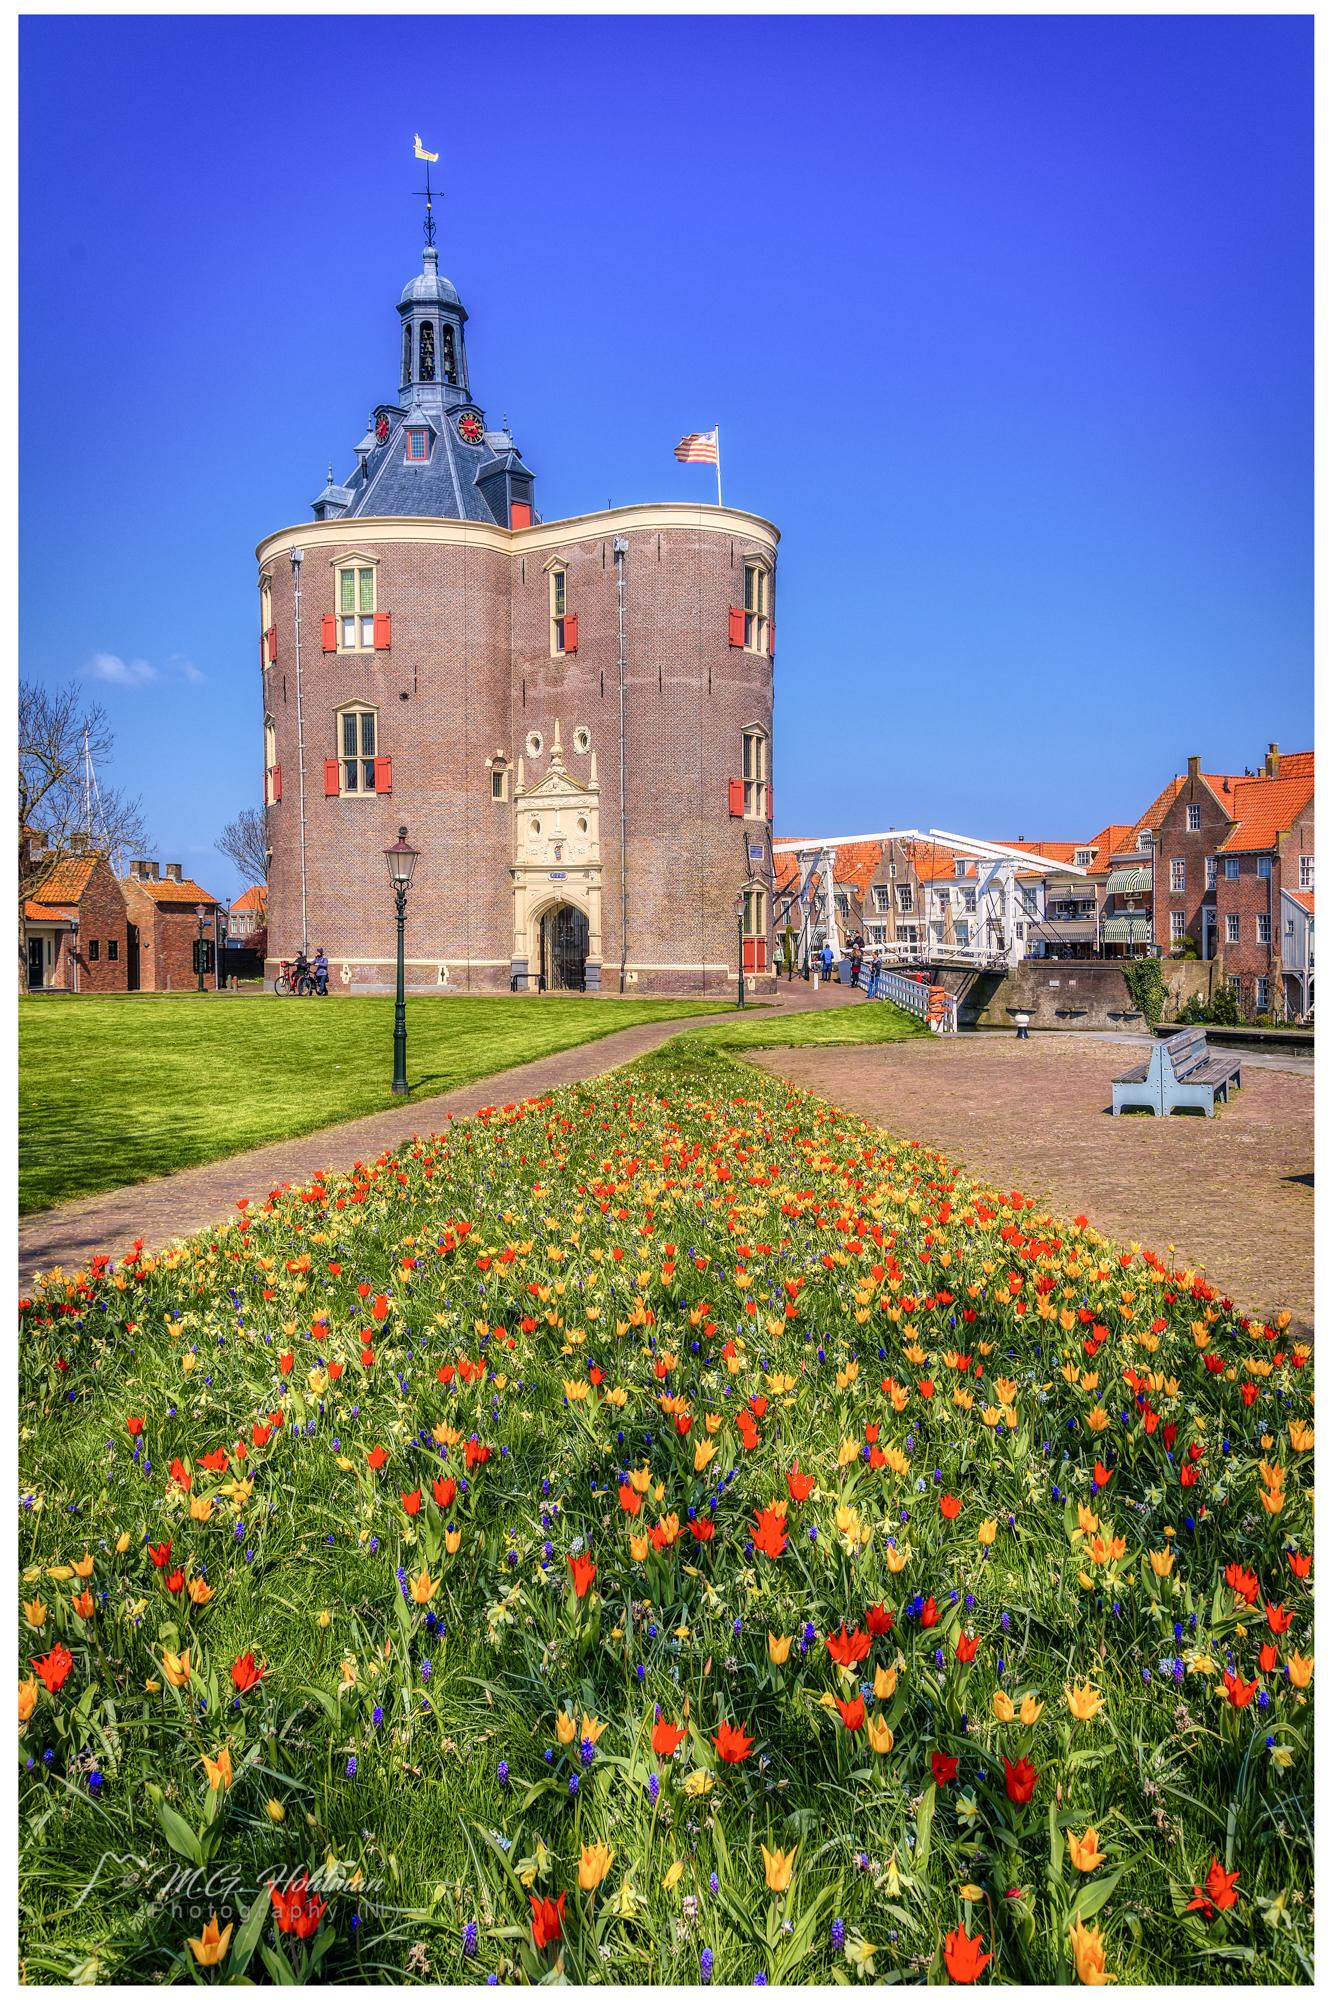 De Drommedaris - Enkhuizen (NL)